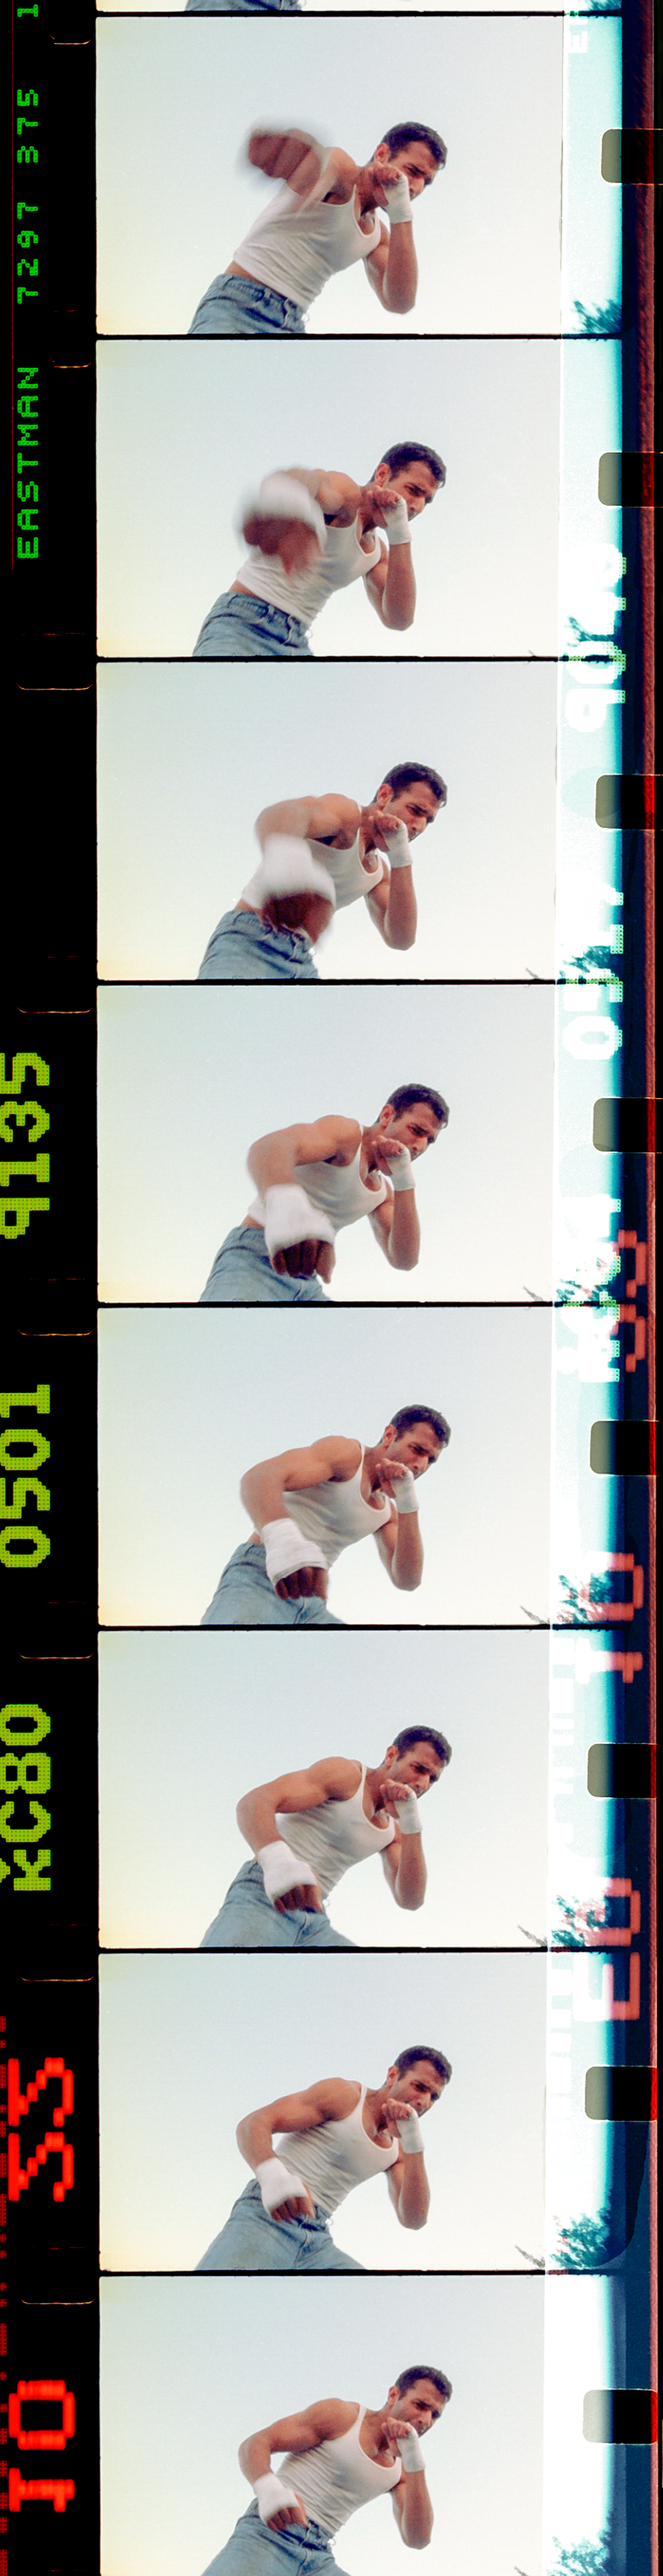 16mm-polo-boxing-double-sh-copy.jpg